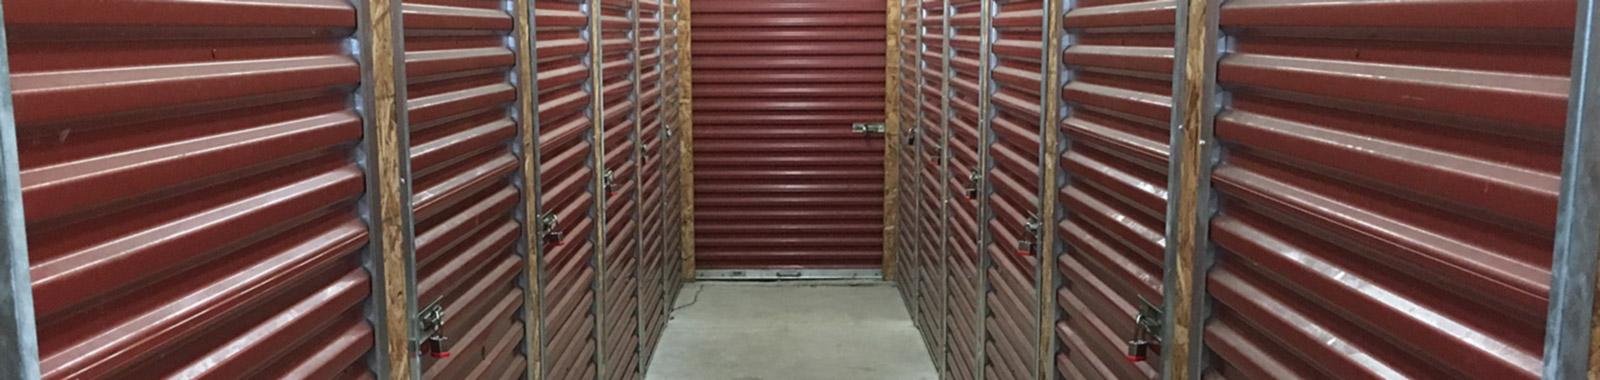 Self Storage Units Bangor Maine Dandk Organizer